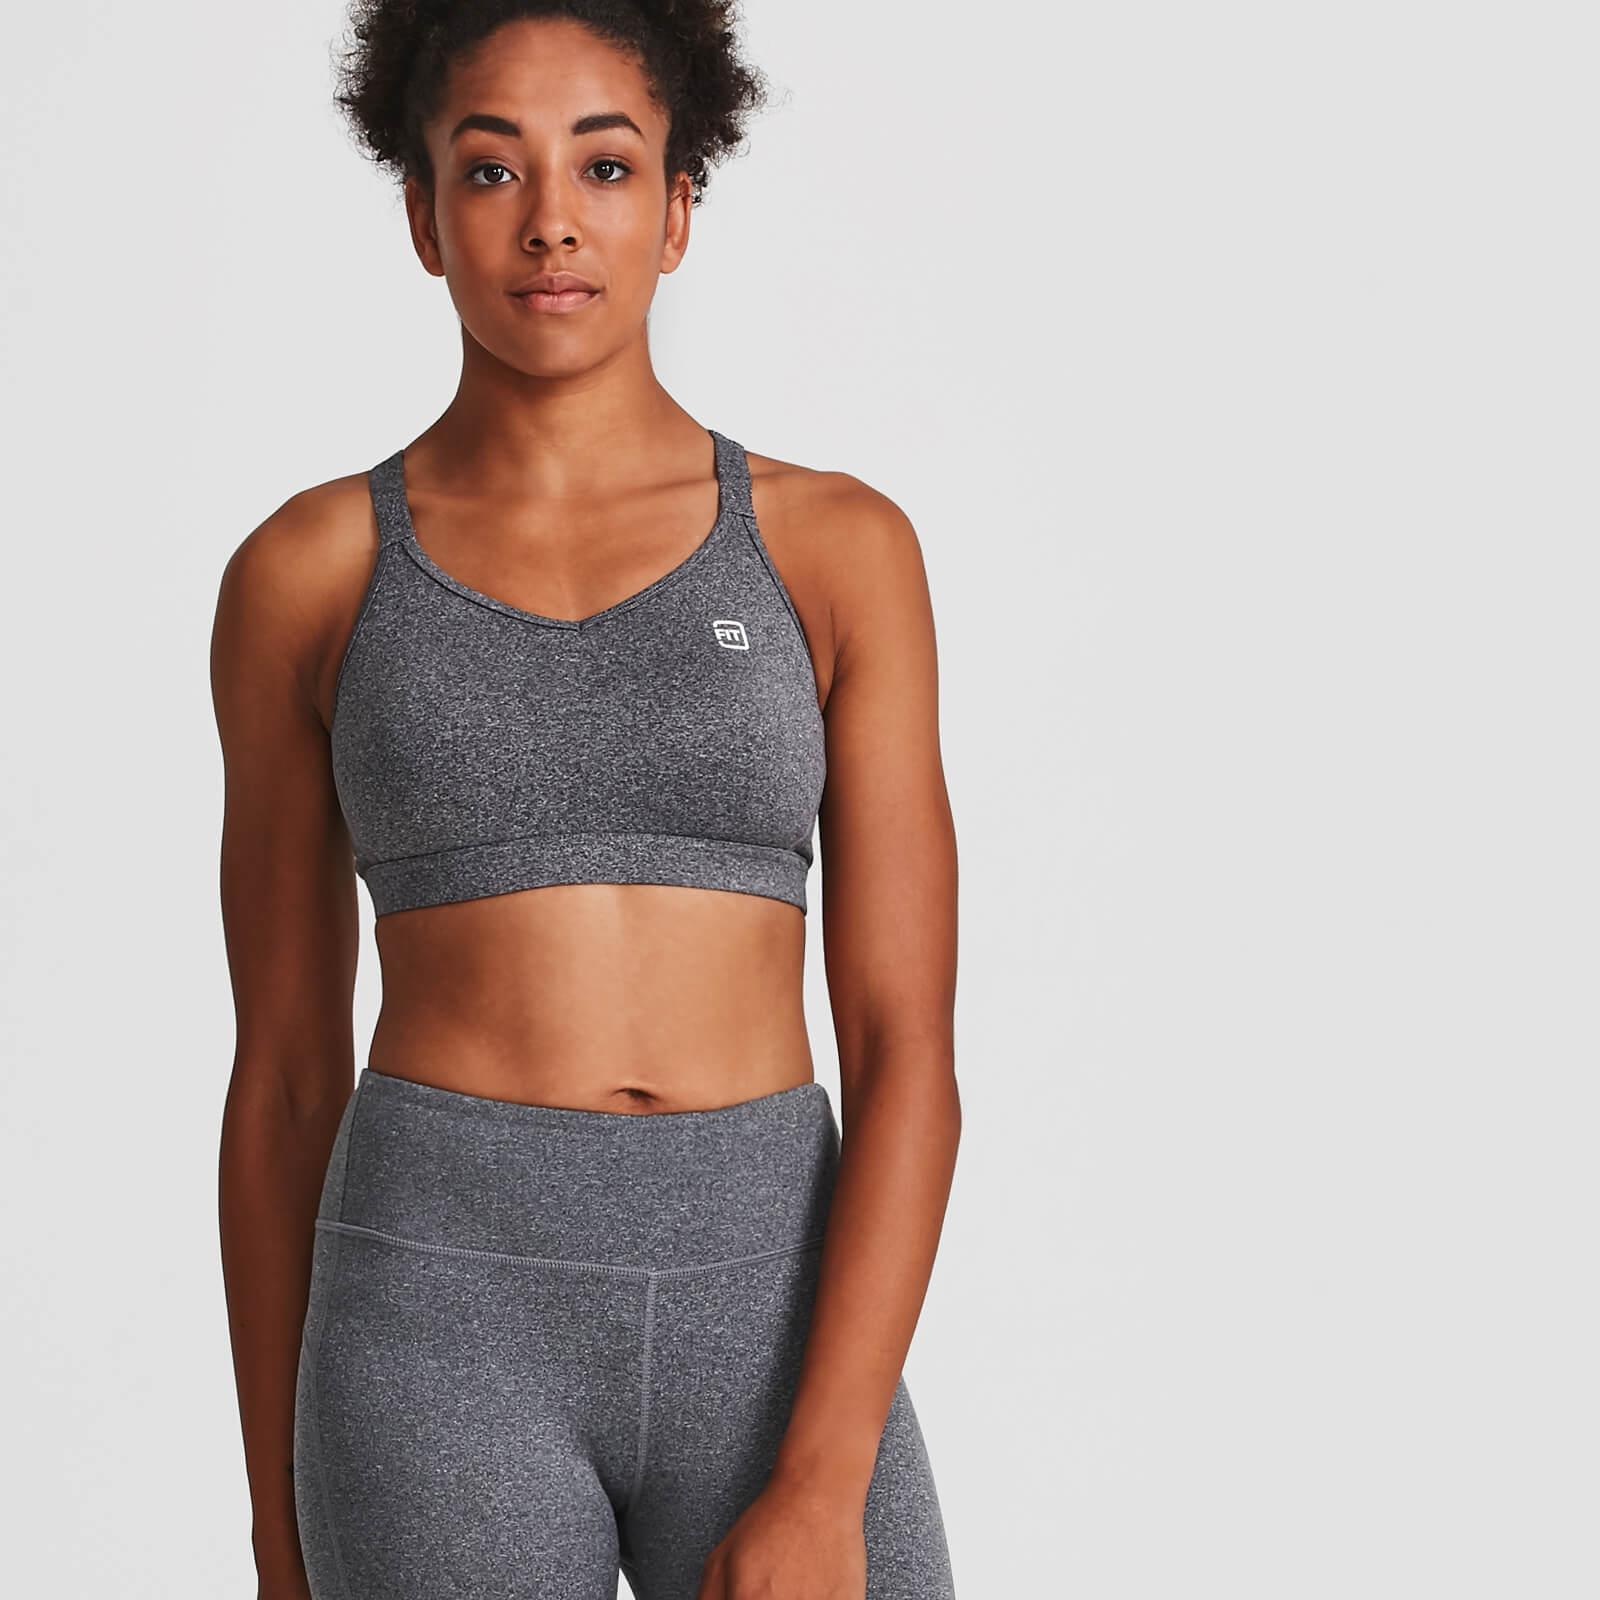 IdealFit Core Sports Bra - Grey - XS - Grey